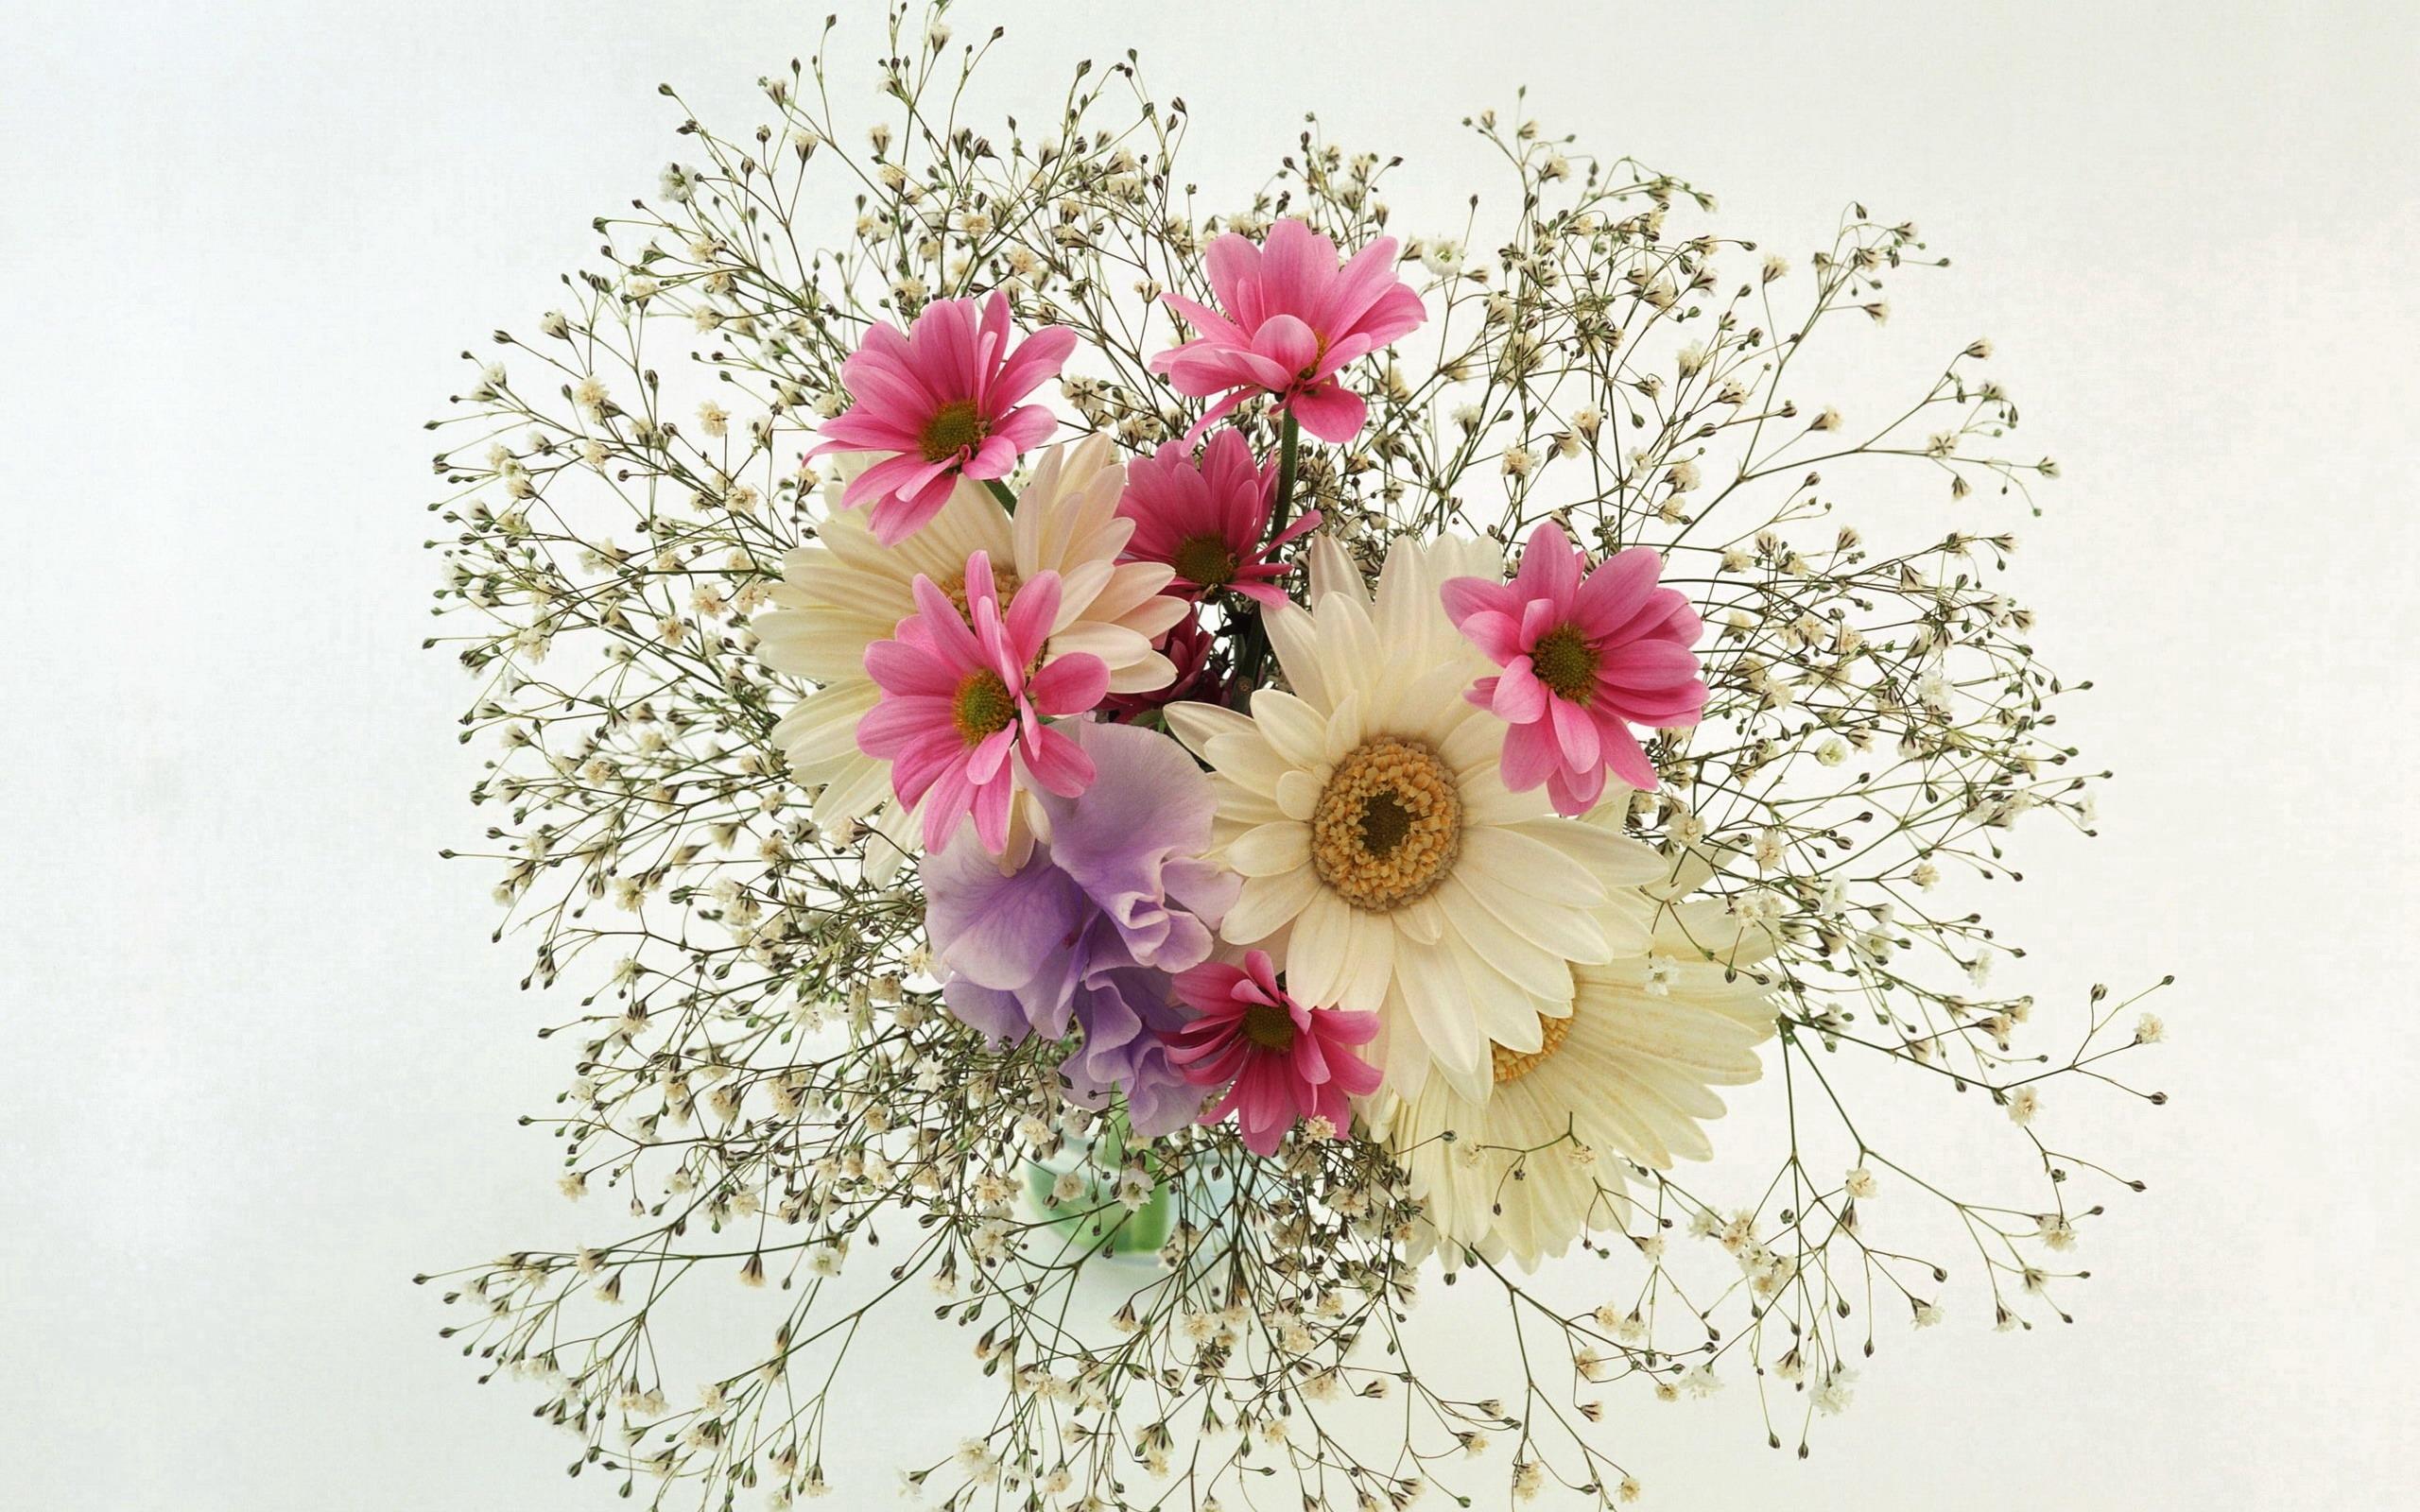 Earth Gerbera Flower Daisy Babys Breath Bouquet White Flower Pink Flower Wallpaper Resolution 2560x1600 Id 76614 Wallha Com